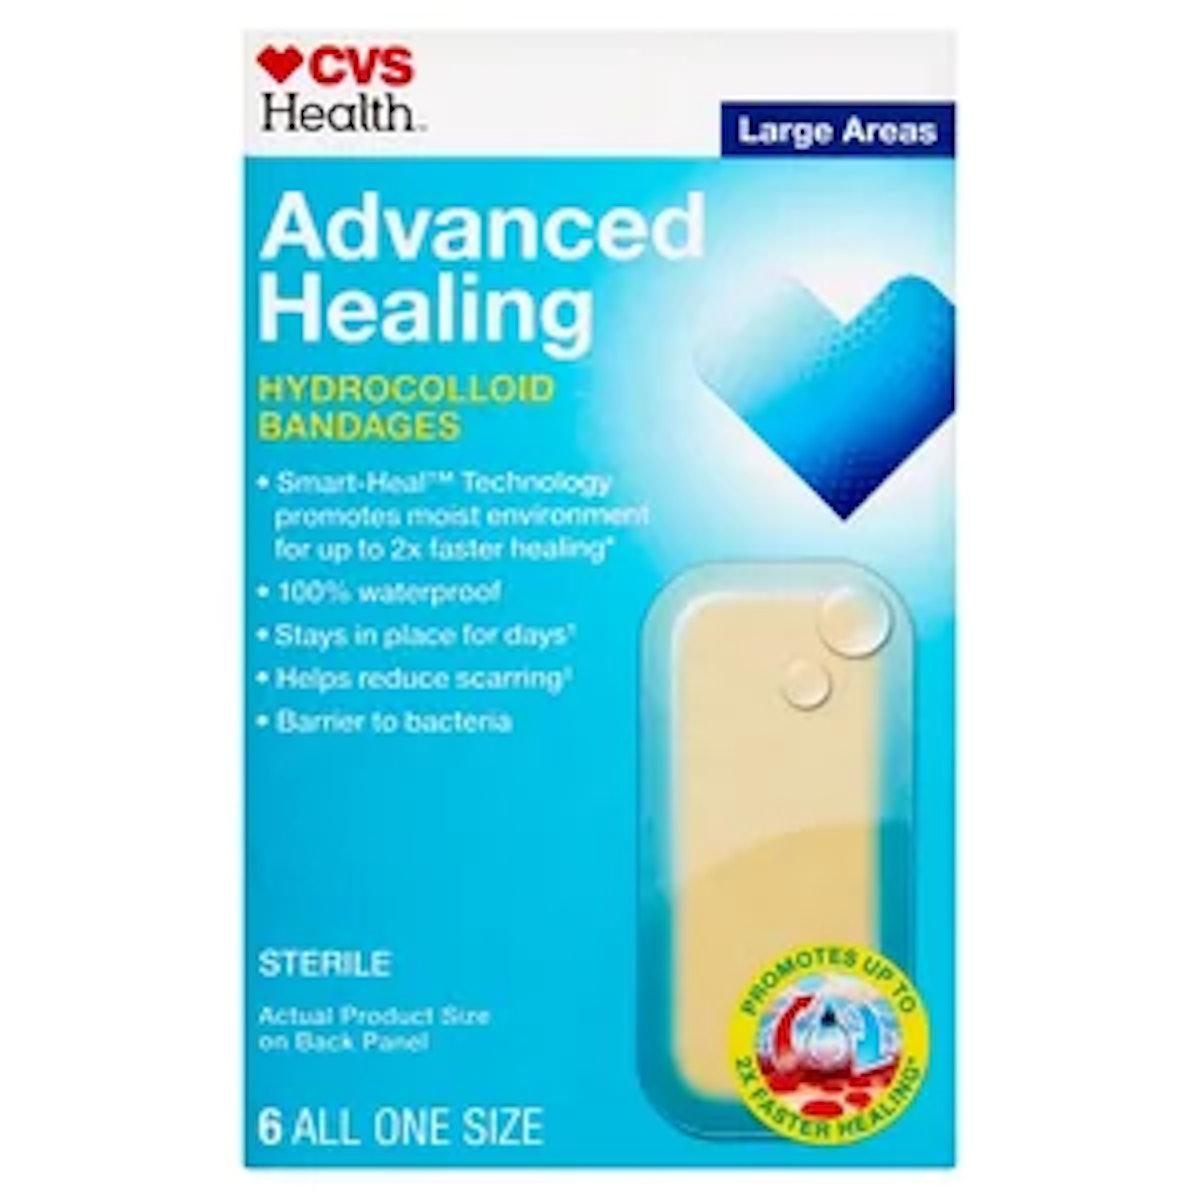 CVS Health Advanced Healing Premium Bandages